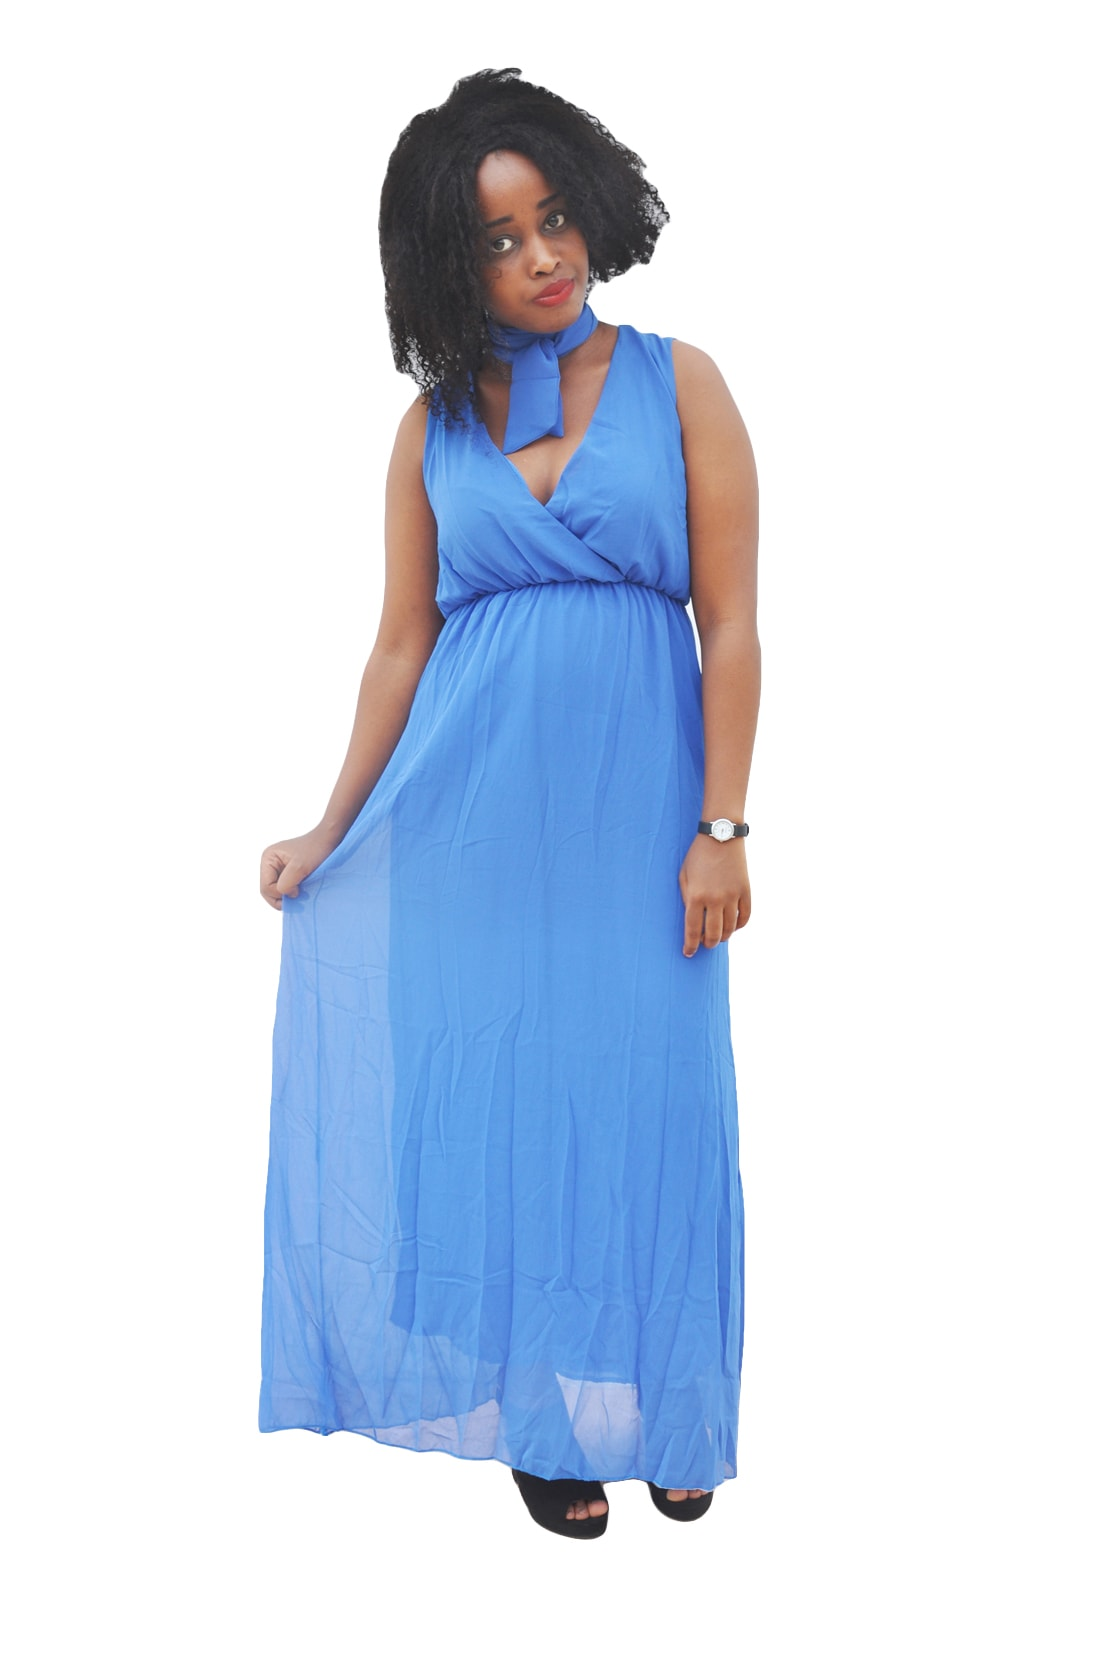 M0297 blue1 Bohemian Dresses maureens.com boutique